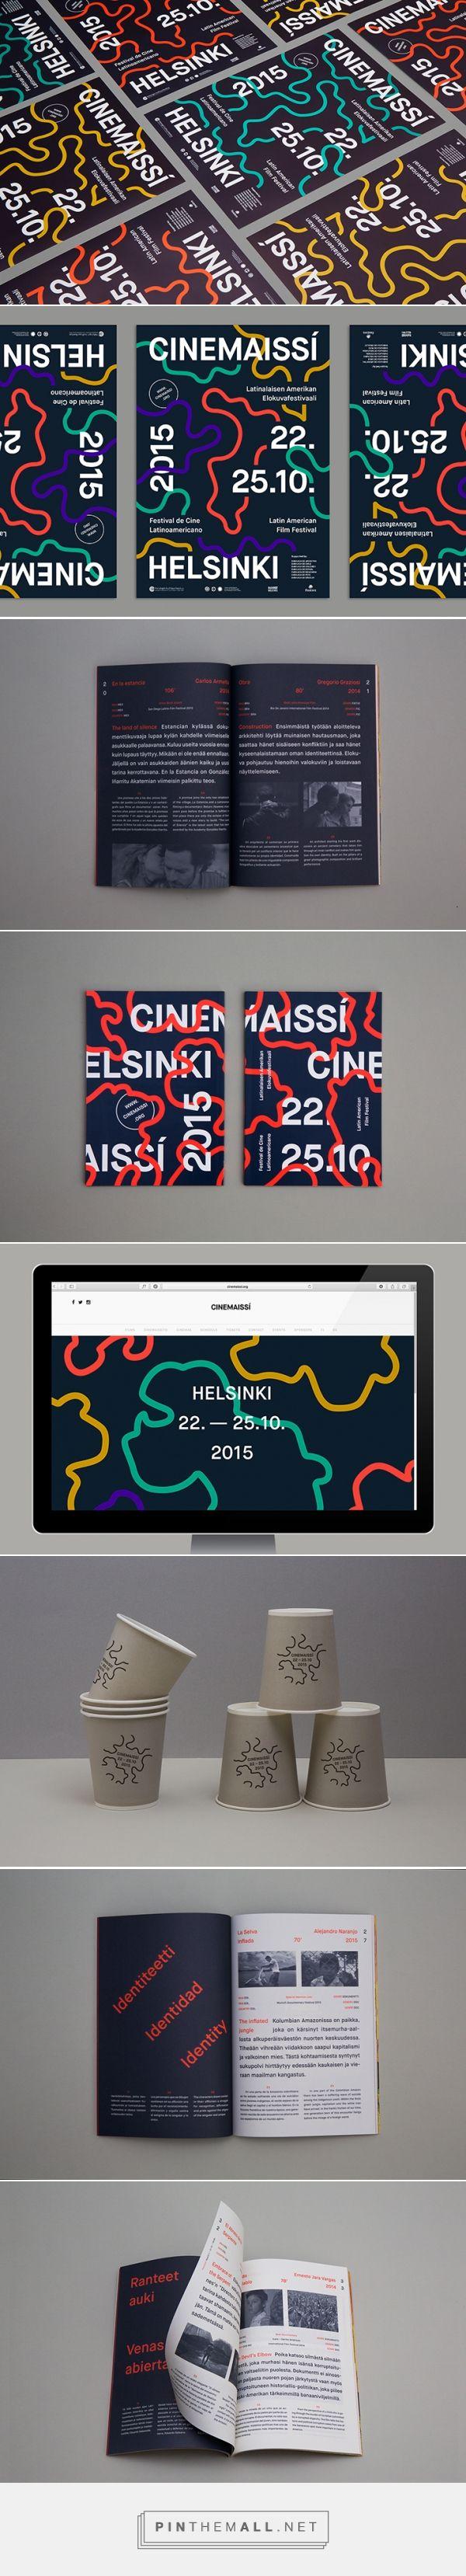 It's Nice That | Simple, adaptable Helsinki film festival identity by Pol Solsona - created via http://pinthemall.net